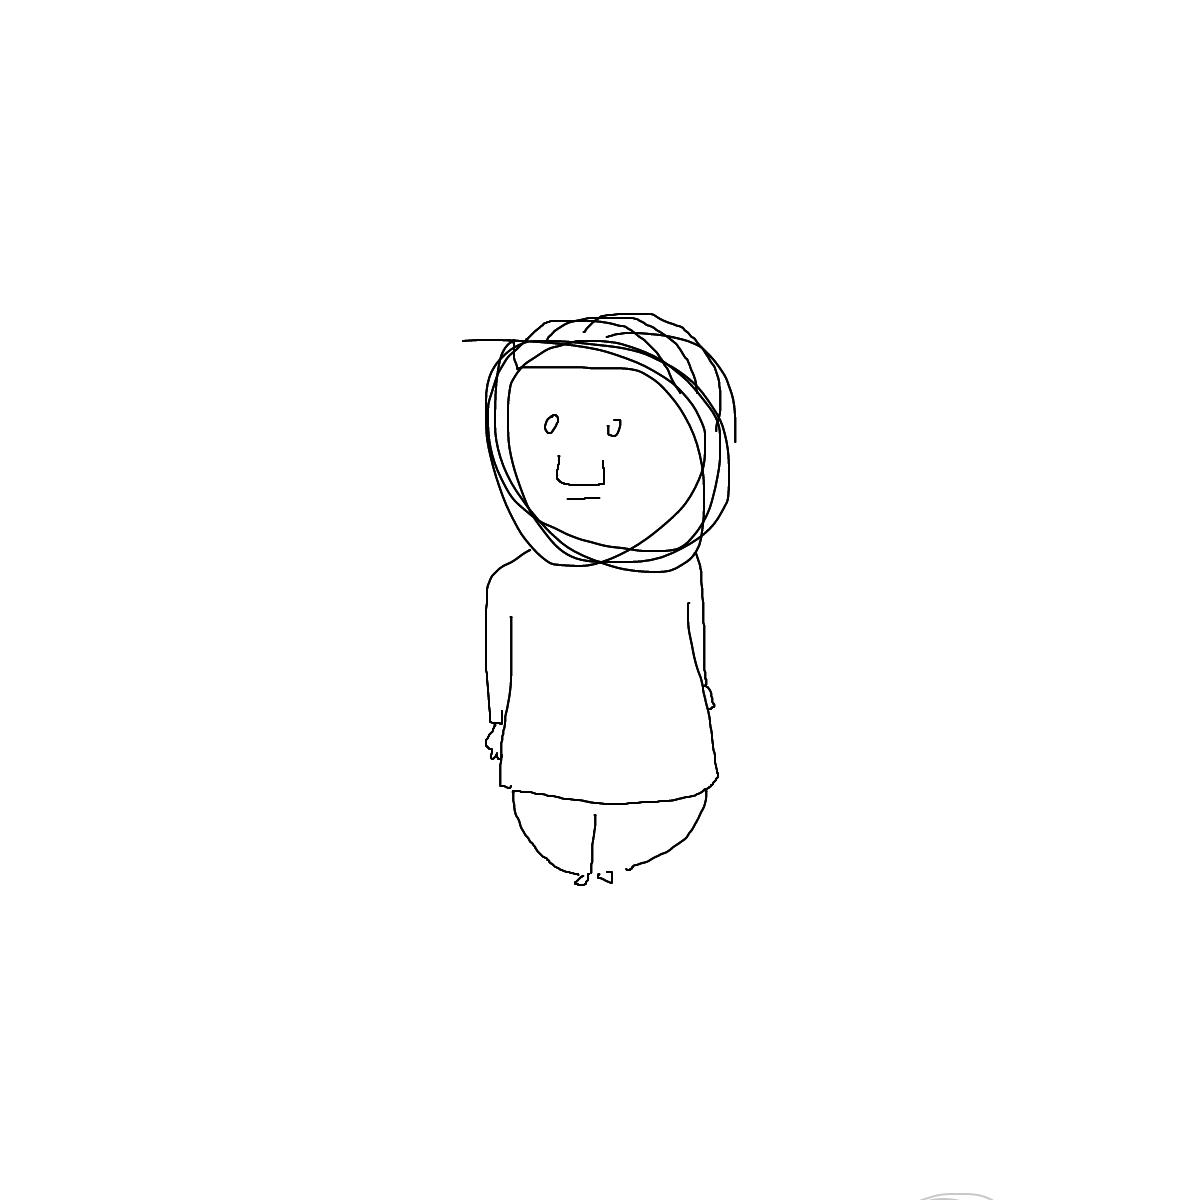 BAAAM drawing#9265 lat:52.0848770141601560lng: 5.1684179306030270